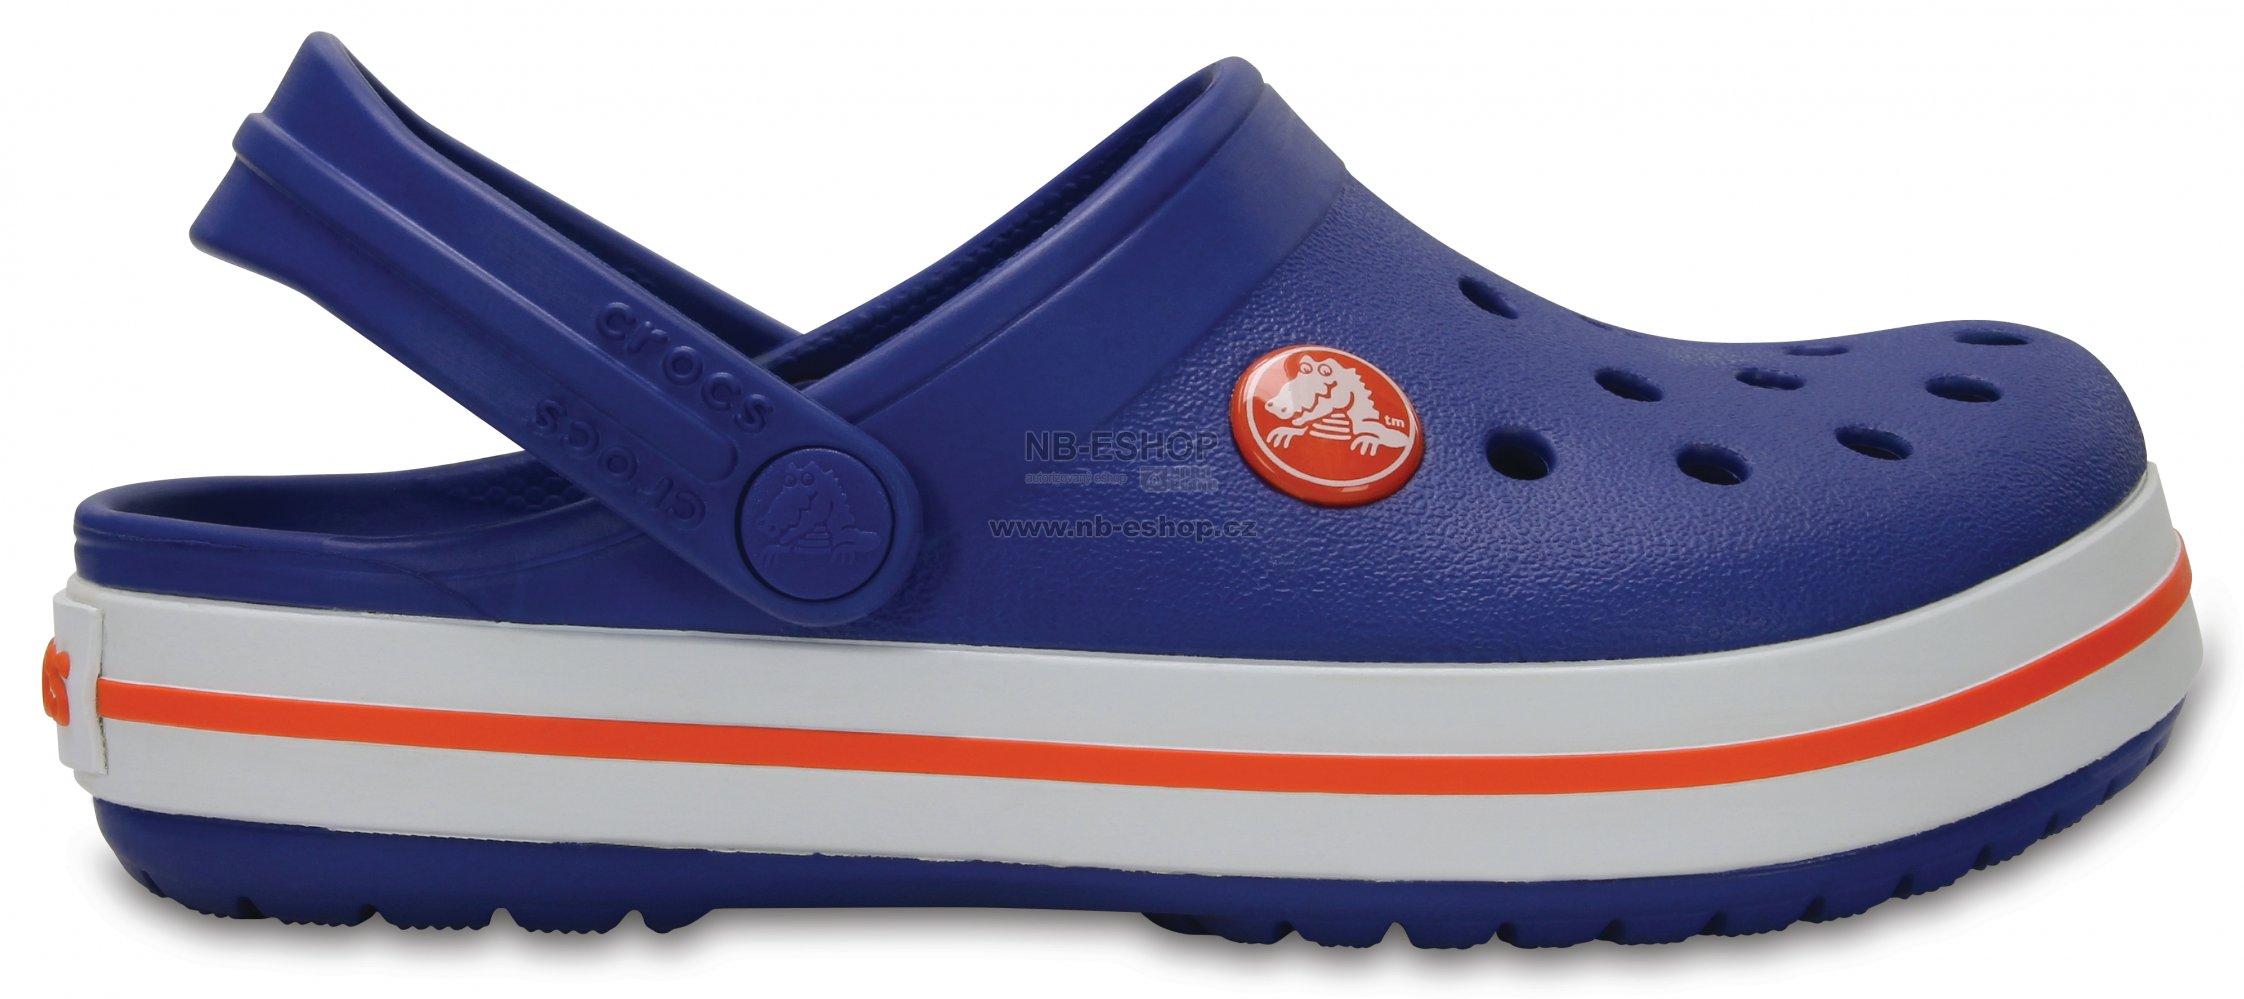 Dětské pantofle CROCS CROCBAND CLOG K 204537-4O5 CERULEAN BLUE ... 864e568e72